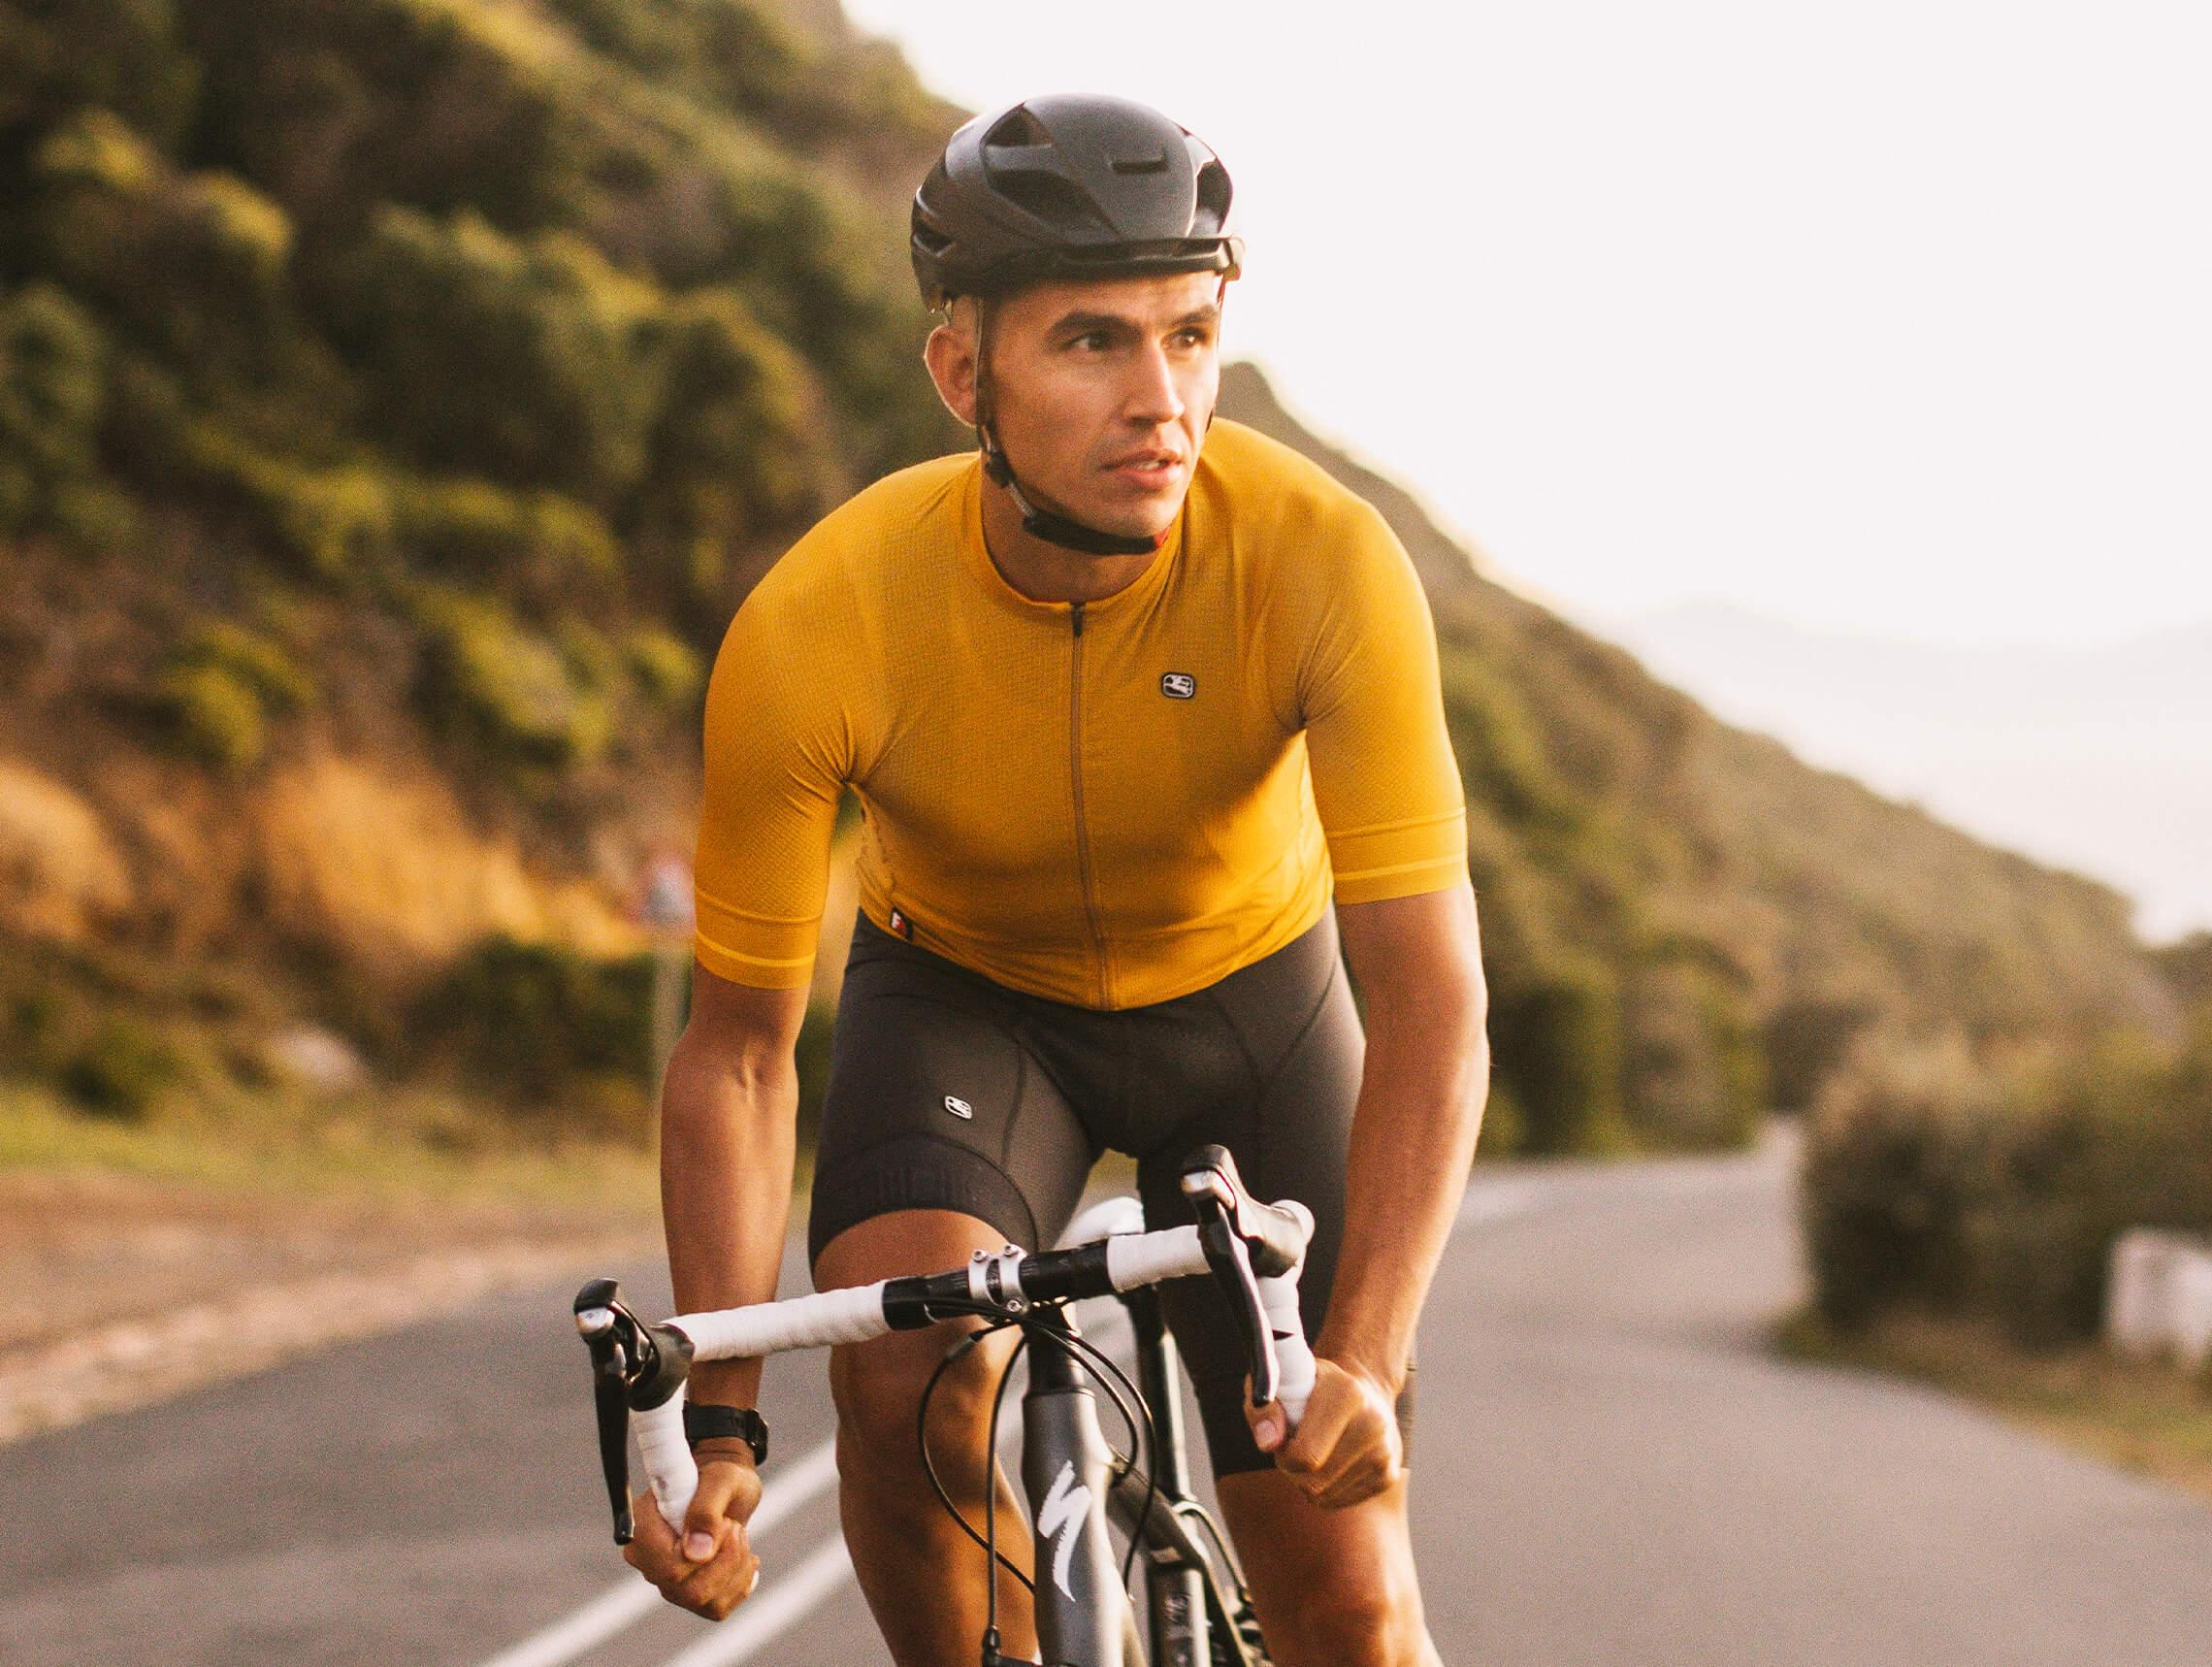 giordana-cycling-ss21-jersey-guide-men-fr-c-1-new